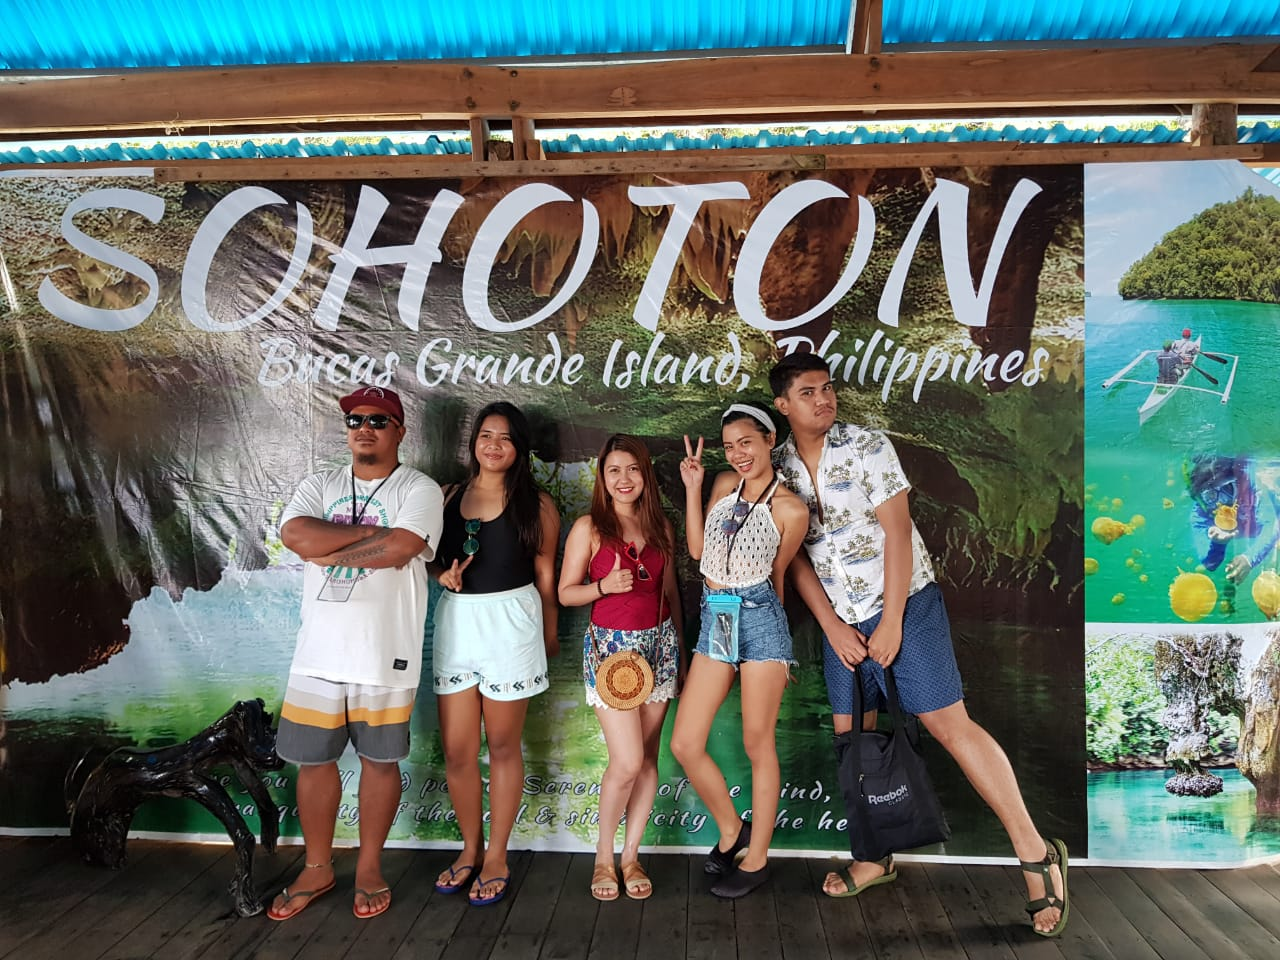 Sohoton Cove Travel Guide, Burgas Grande, Surigao North, Philippines